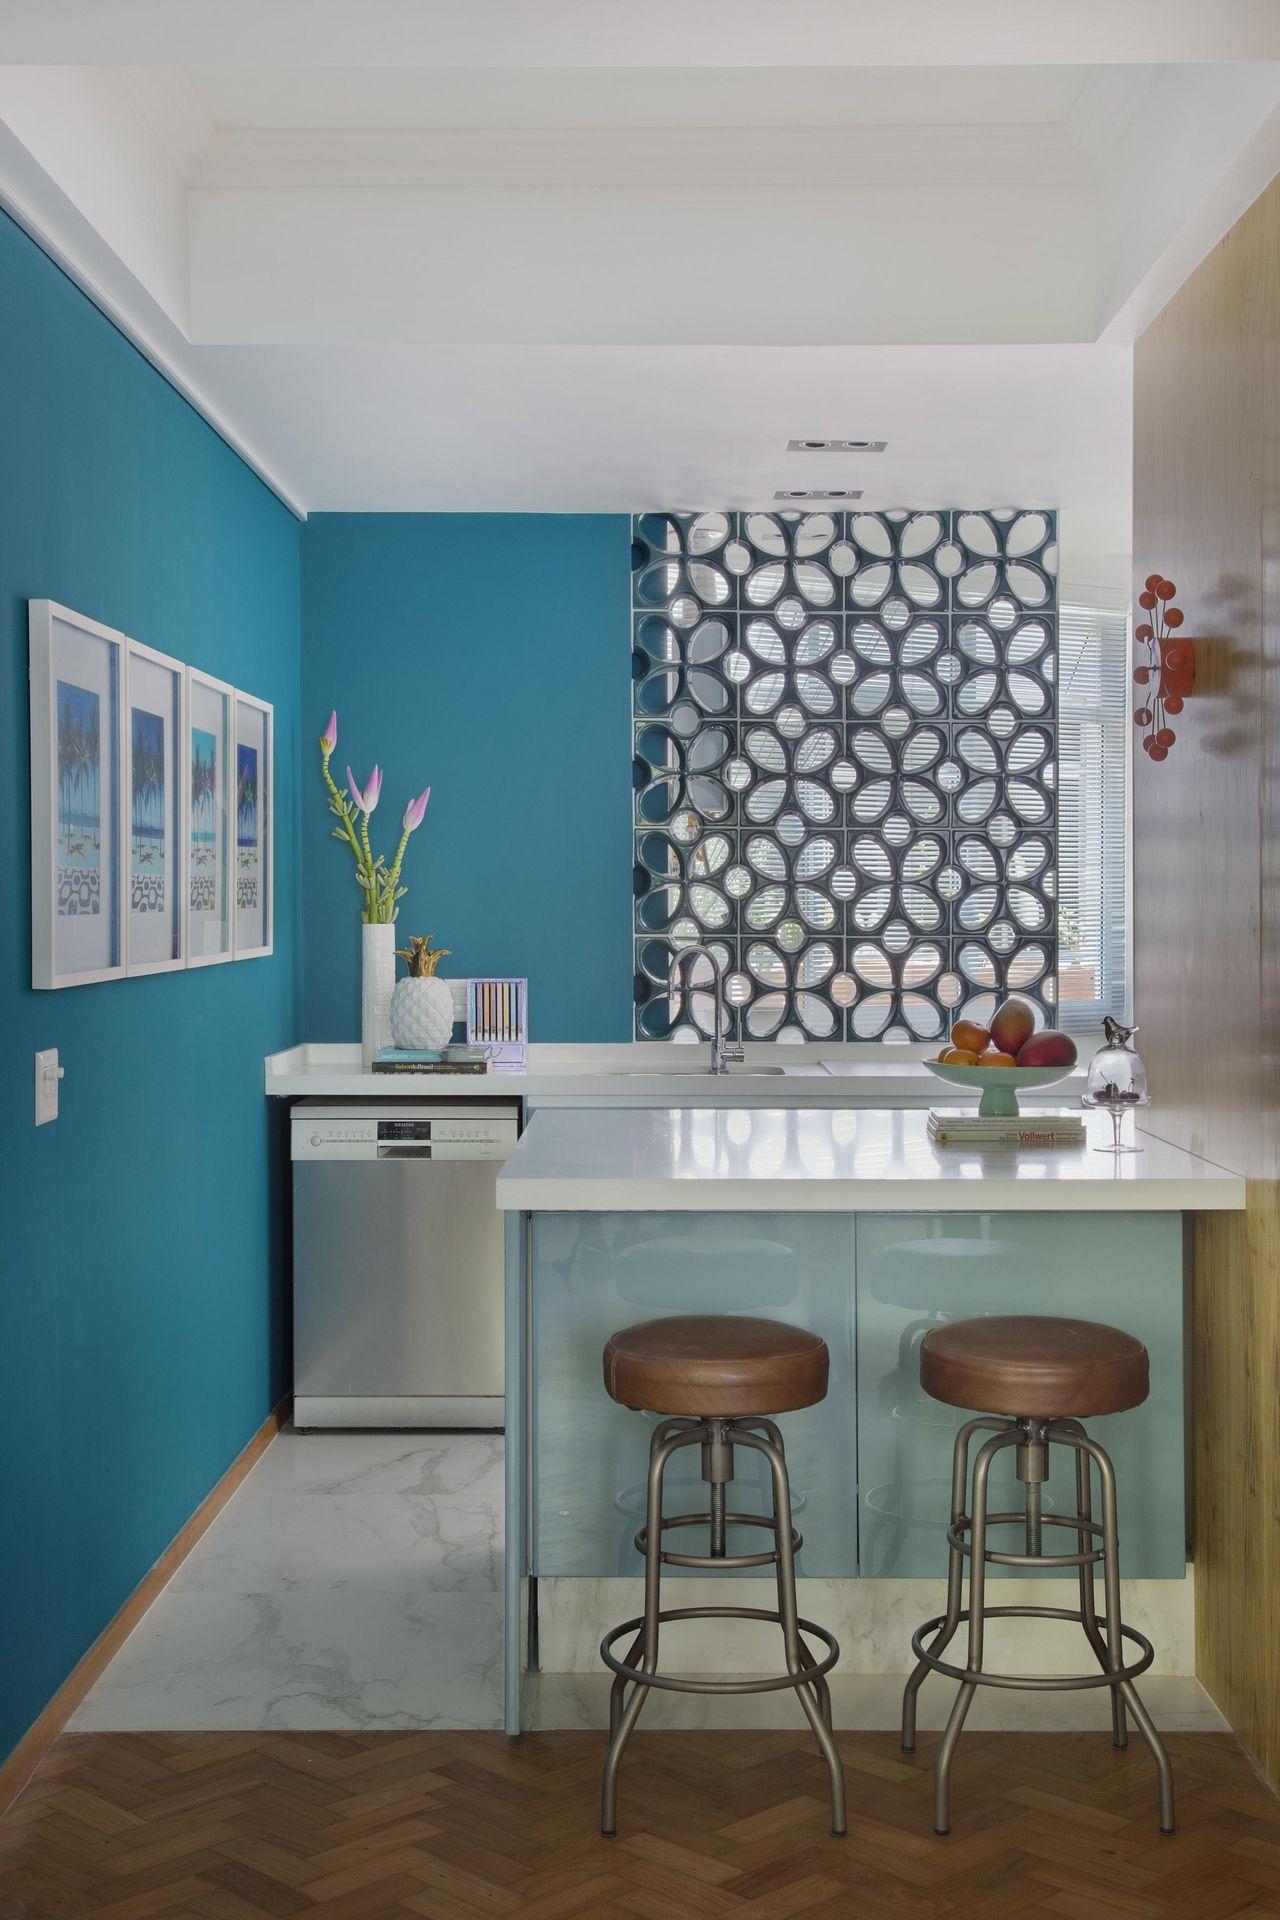 Parede Azul Turquesa De Yamagata Arquitetura 107072 No Viva Decora ~ Escritorio No Quarto De Casal E Quarto Casal Azul Tiffany